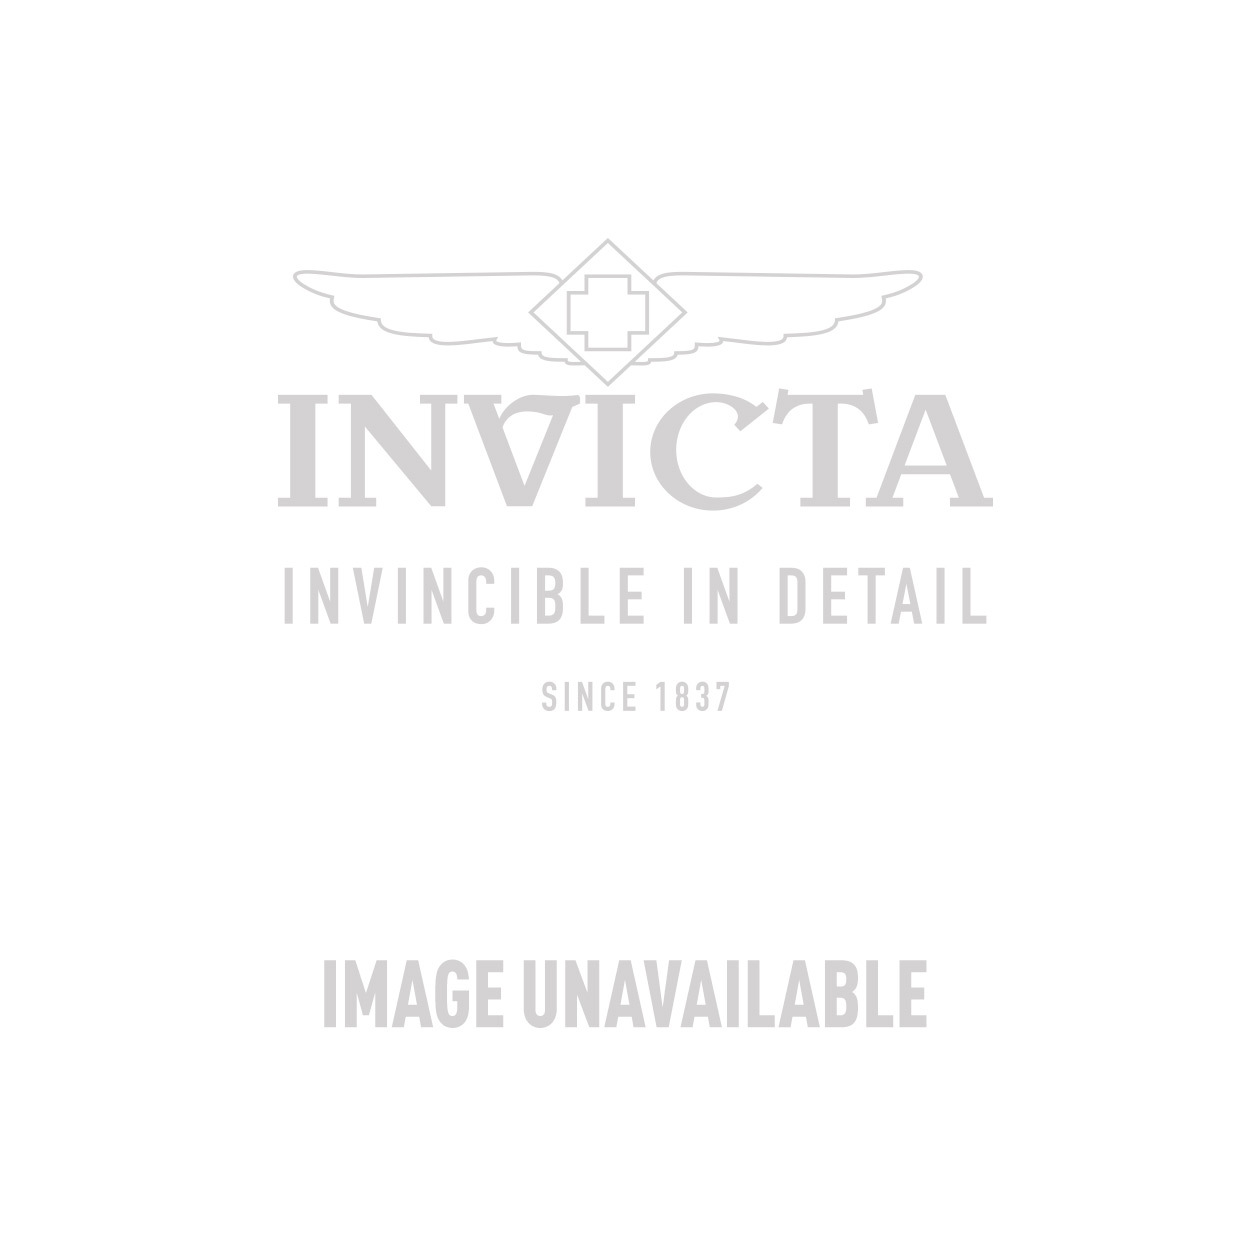 Invicta Sea Base Swiss Made Quartz Watch - Gold, Titanium case with Black tone Polyurethane band - Model 14258